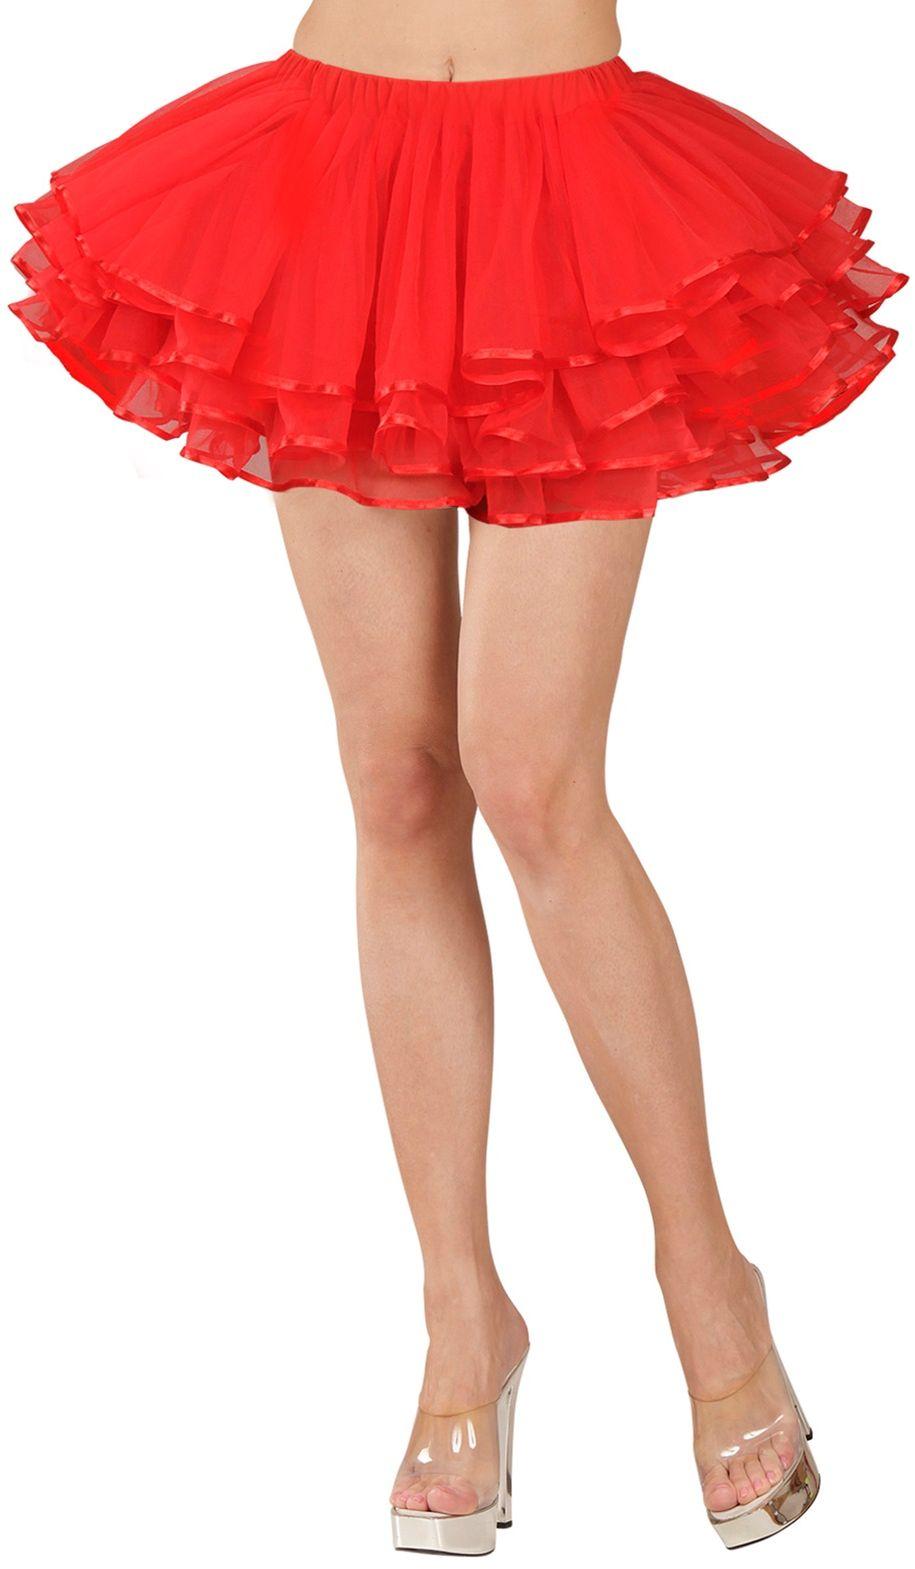 Rode luxe ballerina rokje